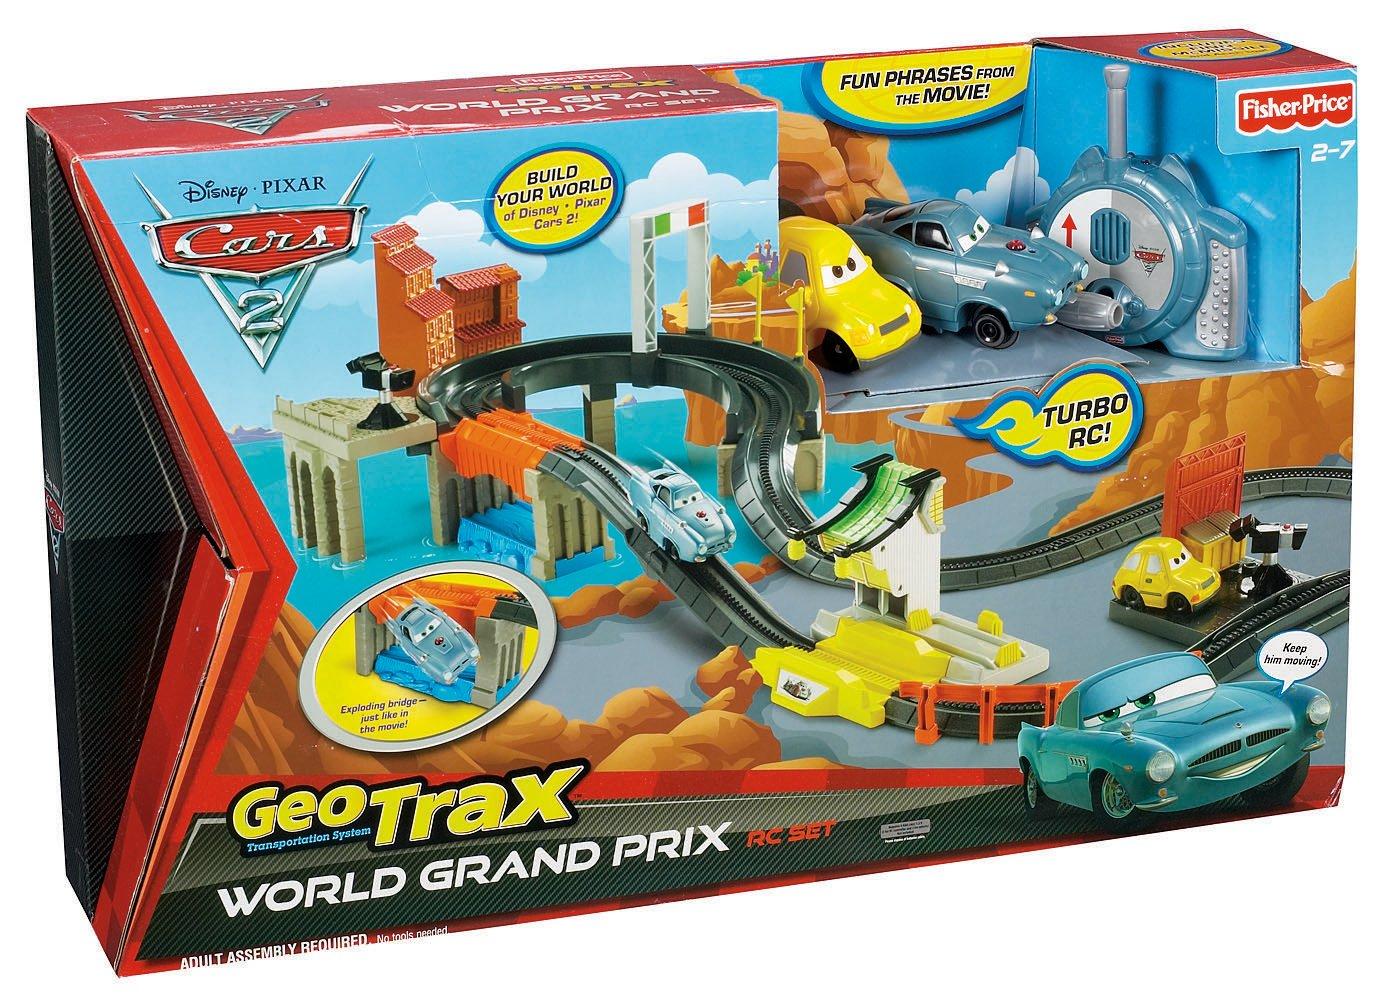 Amazon com fisher price geotrax disney pixar cars 2 world grand prix rc set toys games